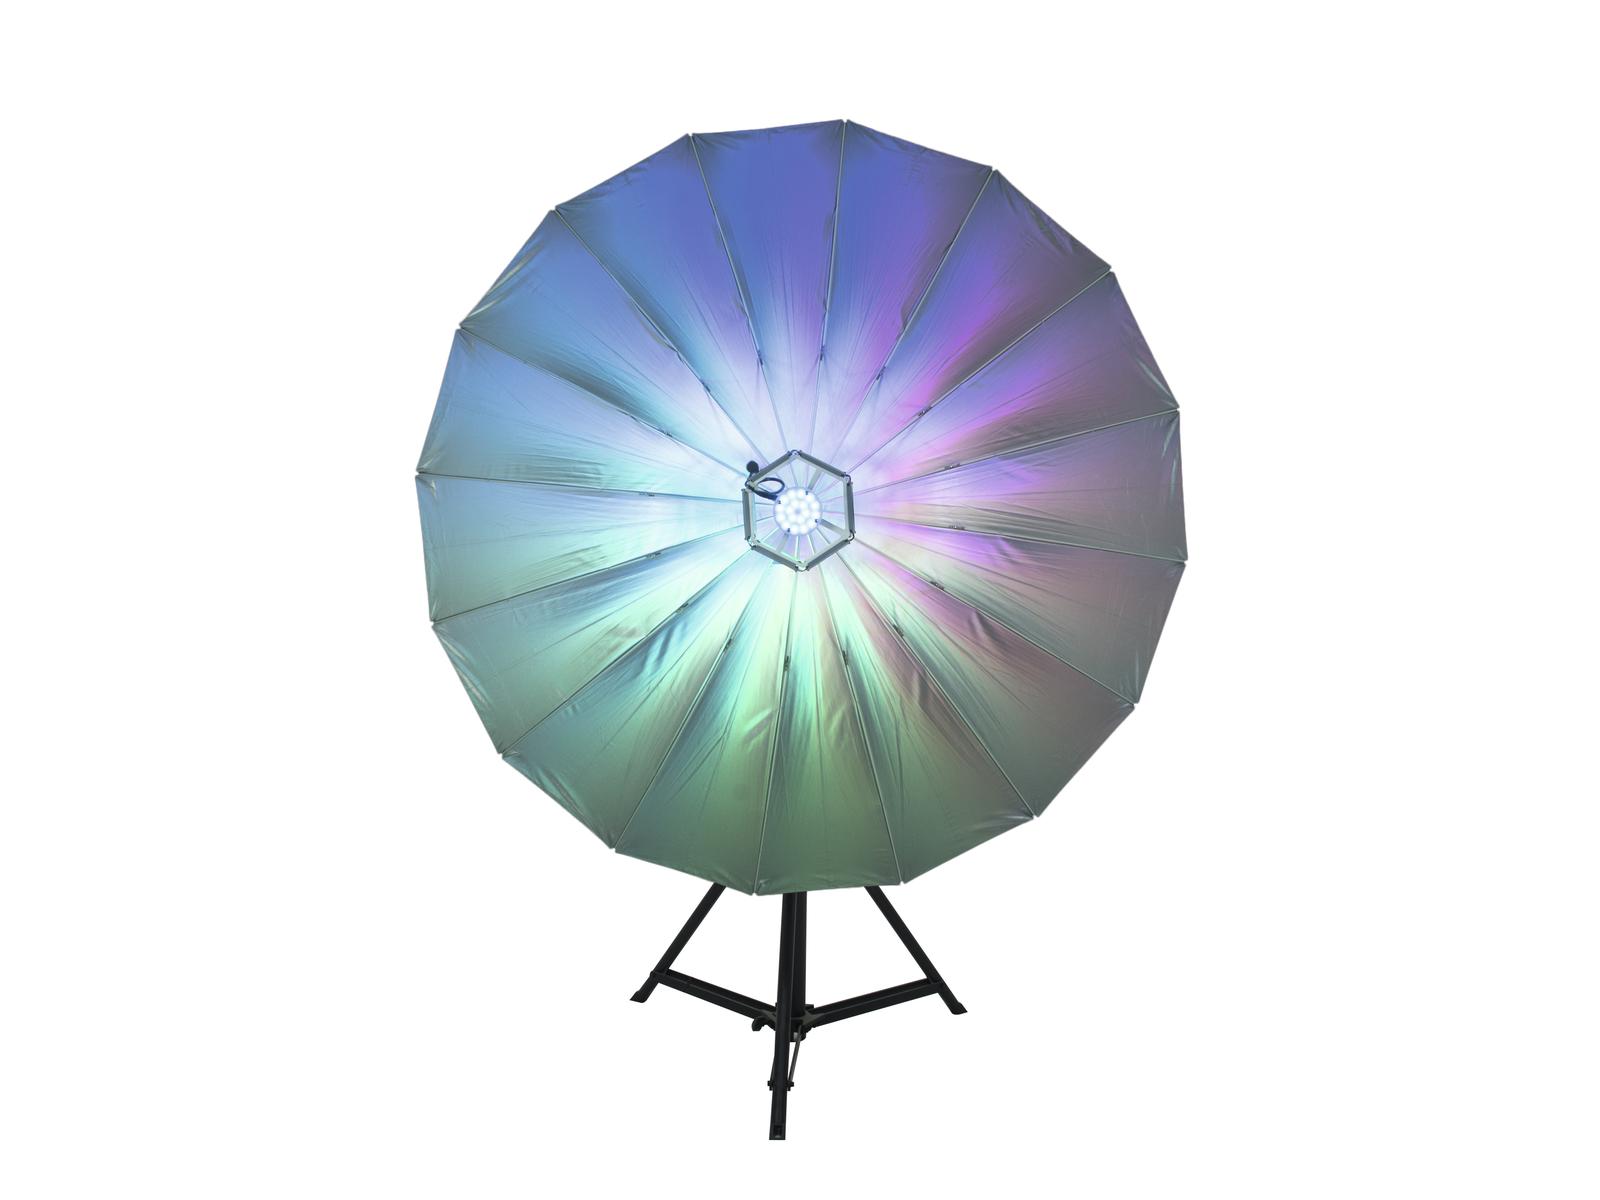 EUROLITE LED Ombrello 140